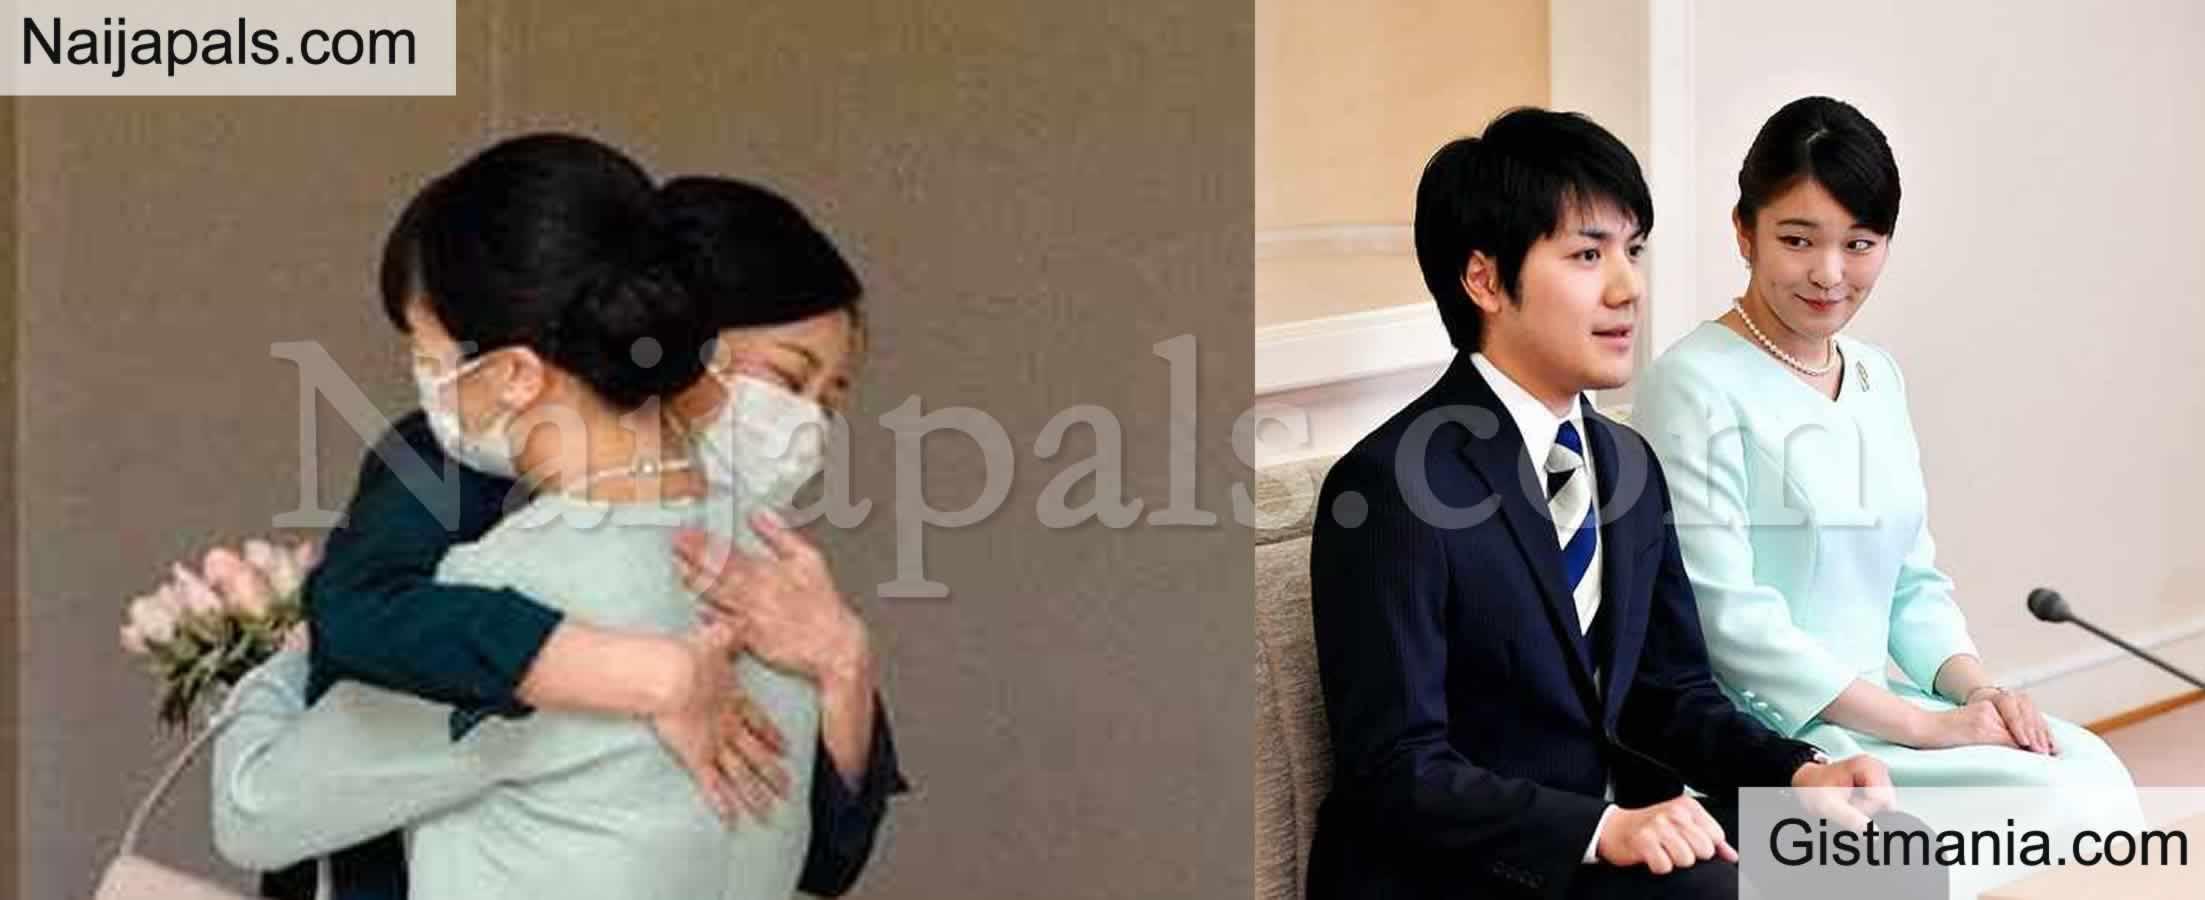 <img alt='.' class='lazyload' data-src='https://img.gistmania.com/emot/comment.gif' /> Photos: <b>Japan's Princess Mako Gives Up Her Royal Status To Marry Her Boyfriend, Kei Komuro</b>